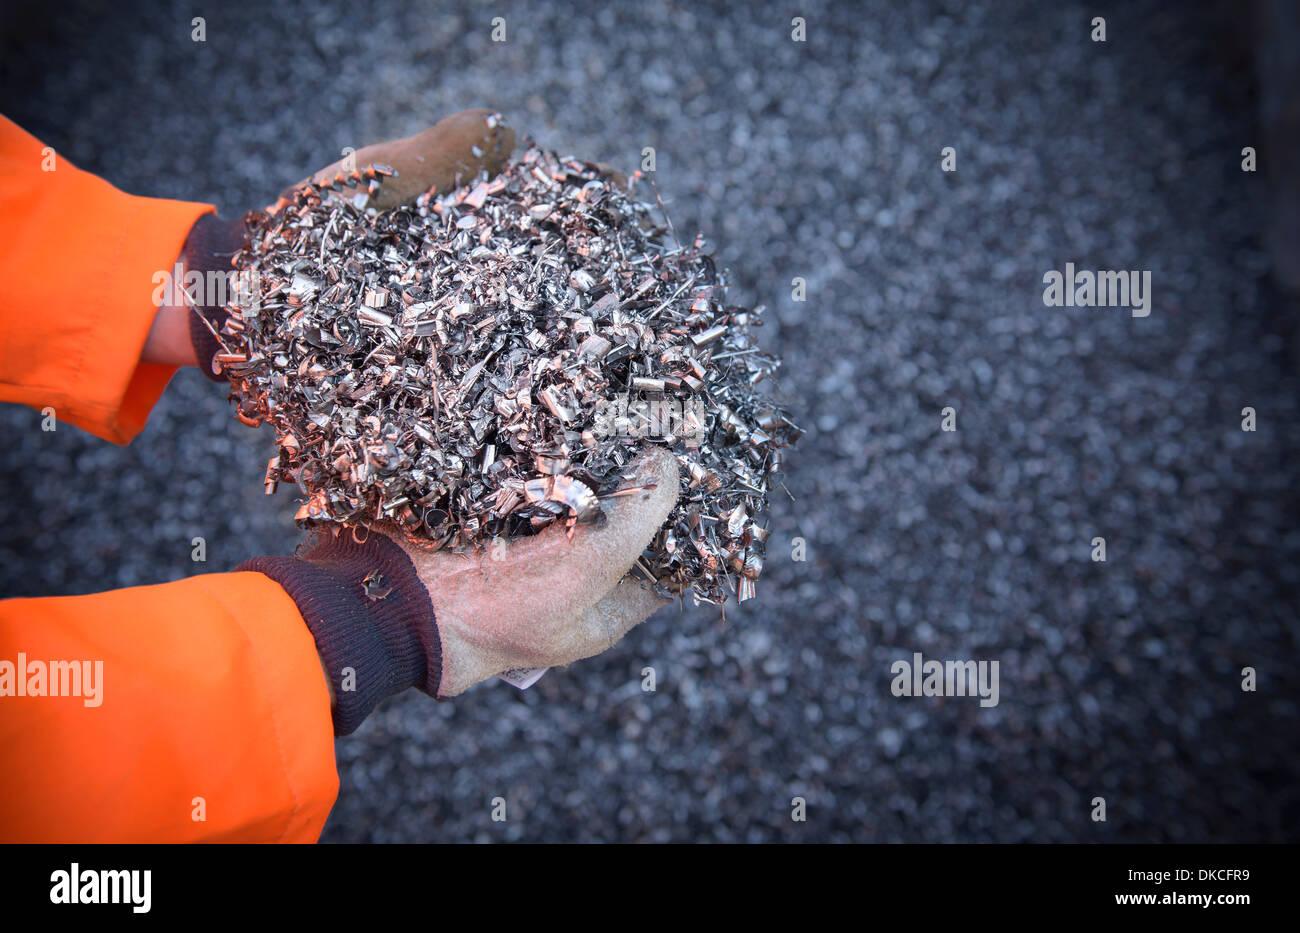 Close up of worker holding titanium turnings - Stock Image